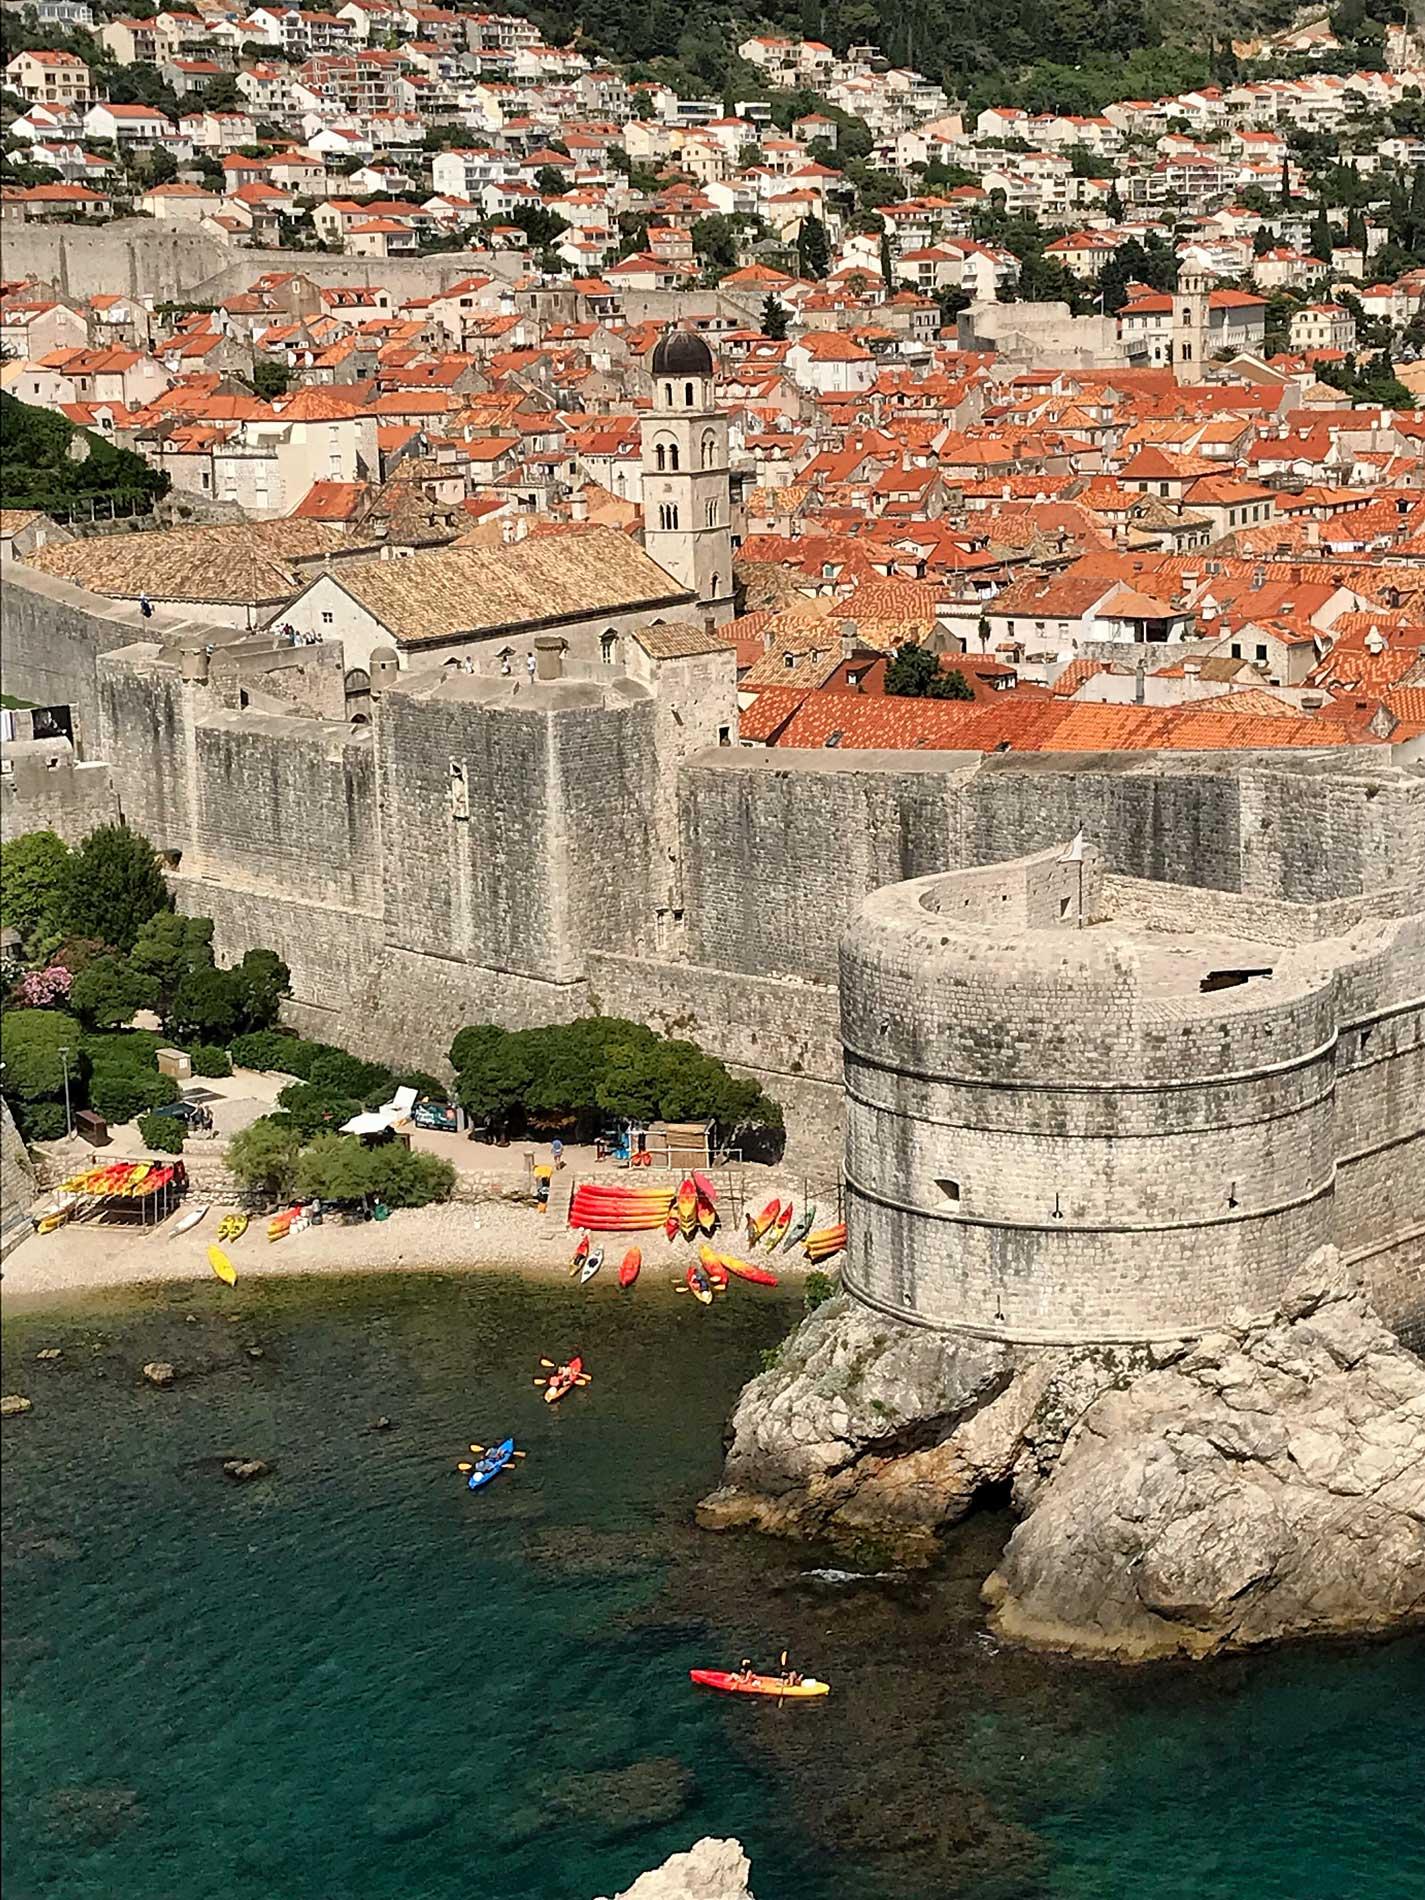 Dubrovnik-Croazia-panorama-da-Forte-Lovrijanec-tetti-rossi-kayak